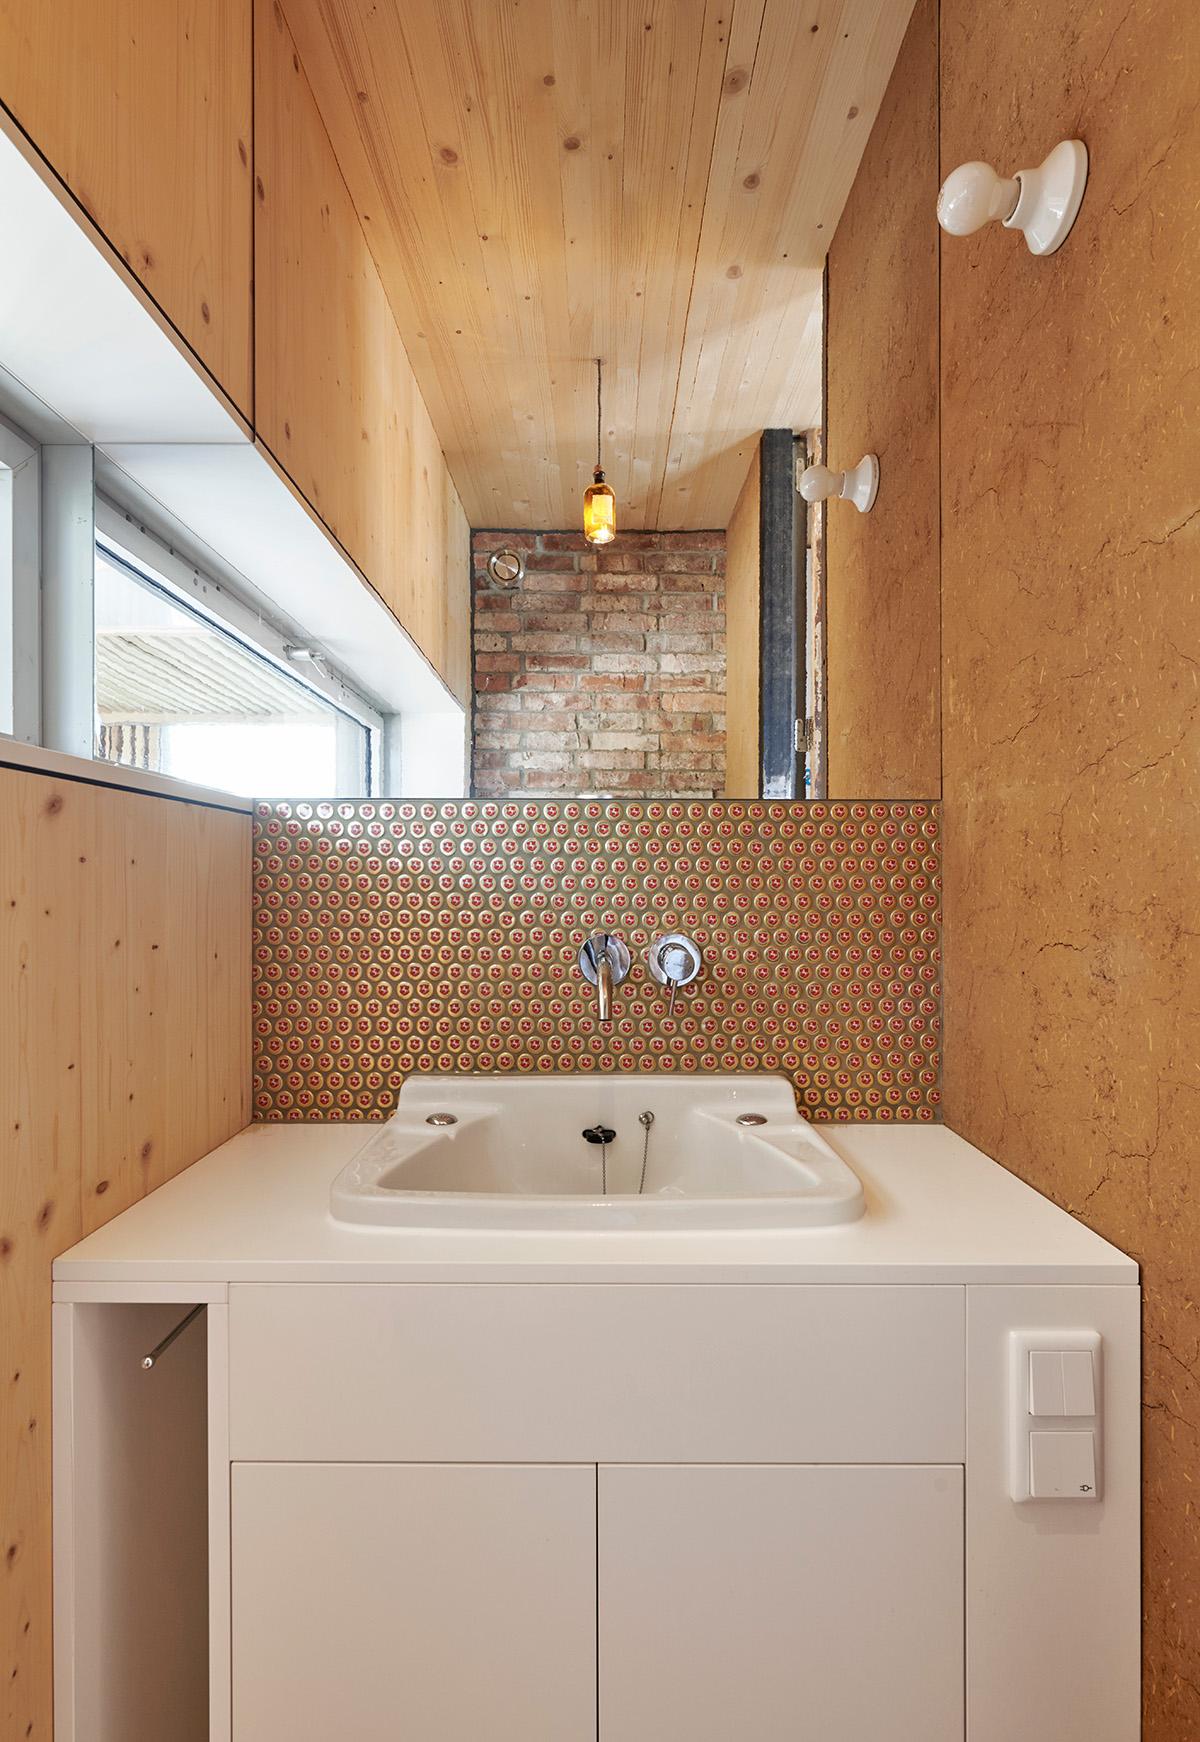 Cityförster architecture+urbanism, Recyclinghaus Hannover-Kronsberg, 2015 – 2019